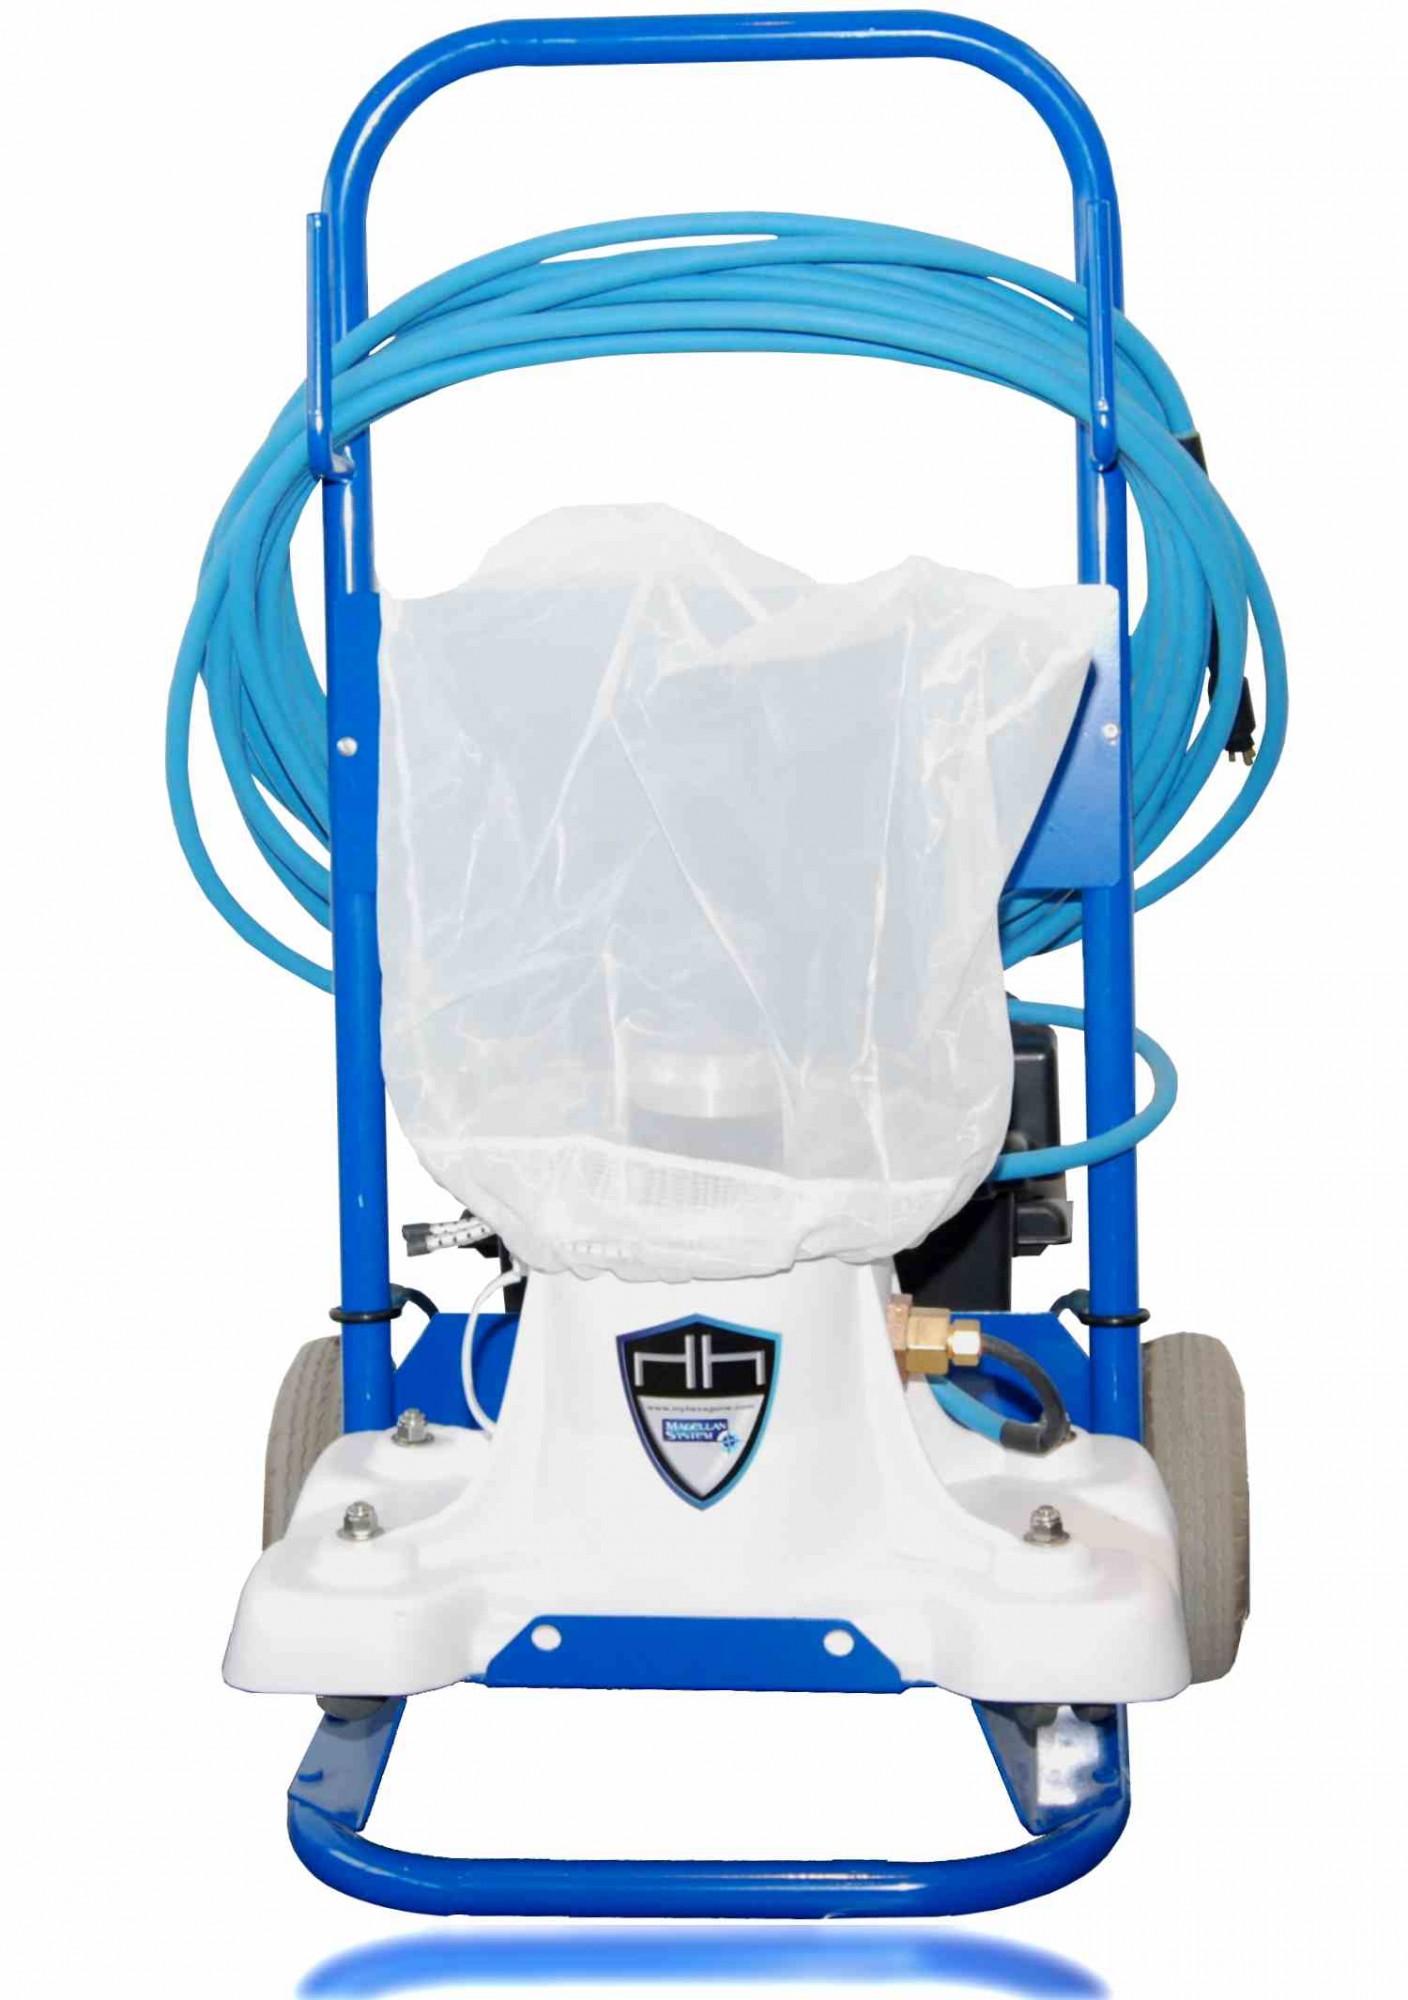 Aspirateur manuel avec filtration integree quick vac jp - Aspirateur piscine electrique manuel ...